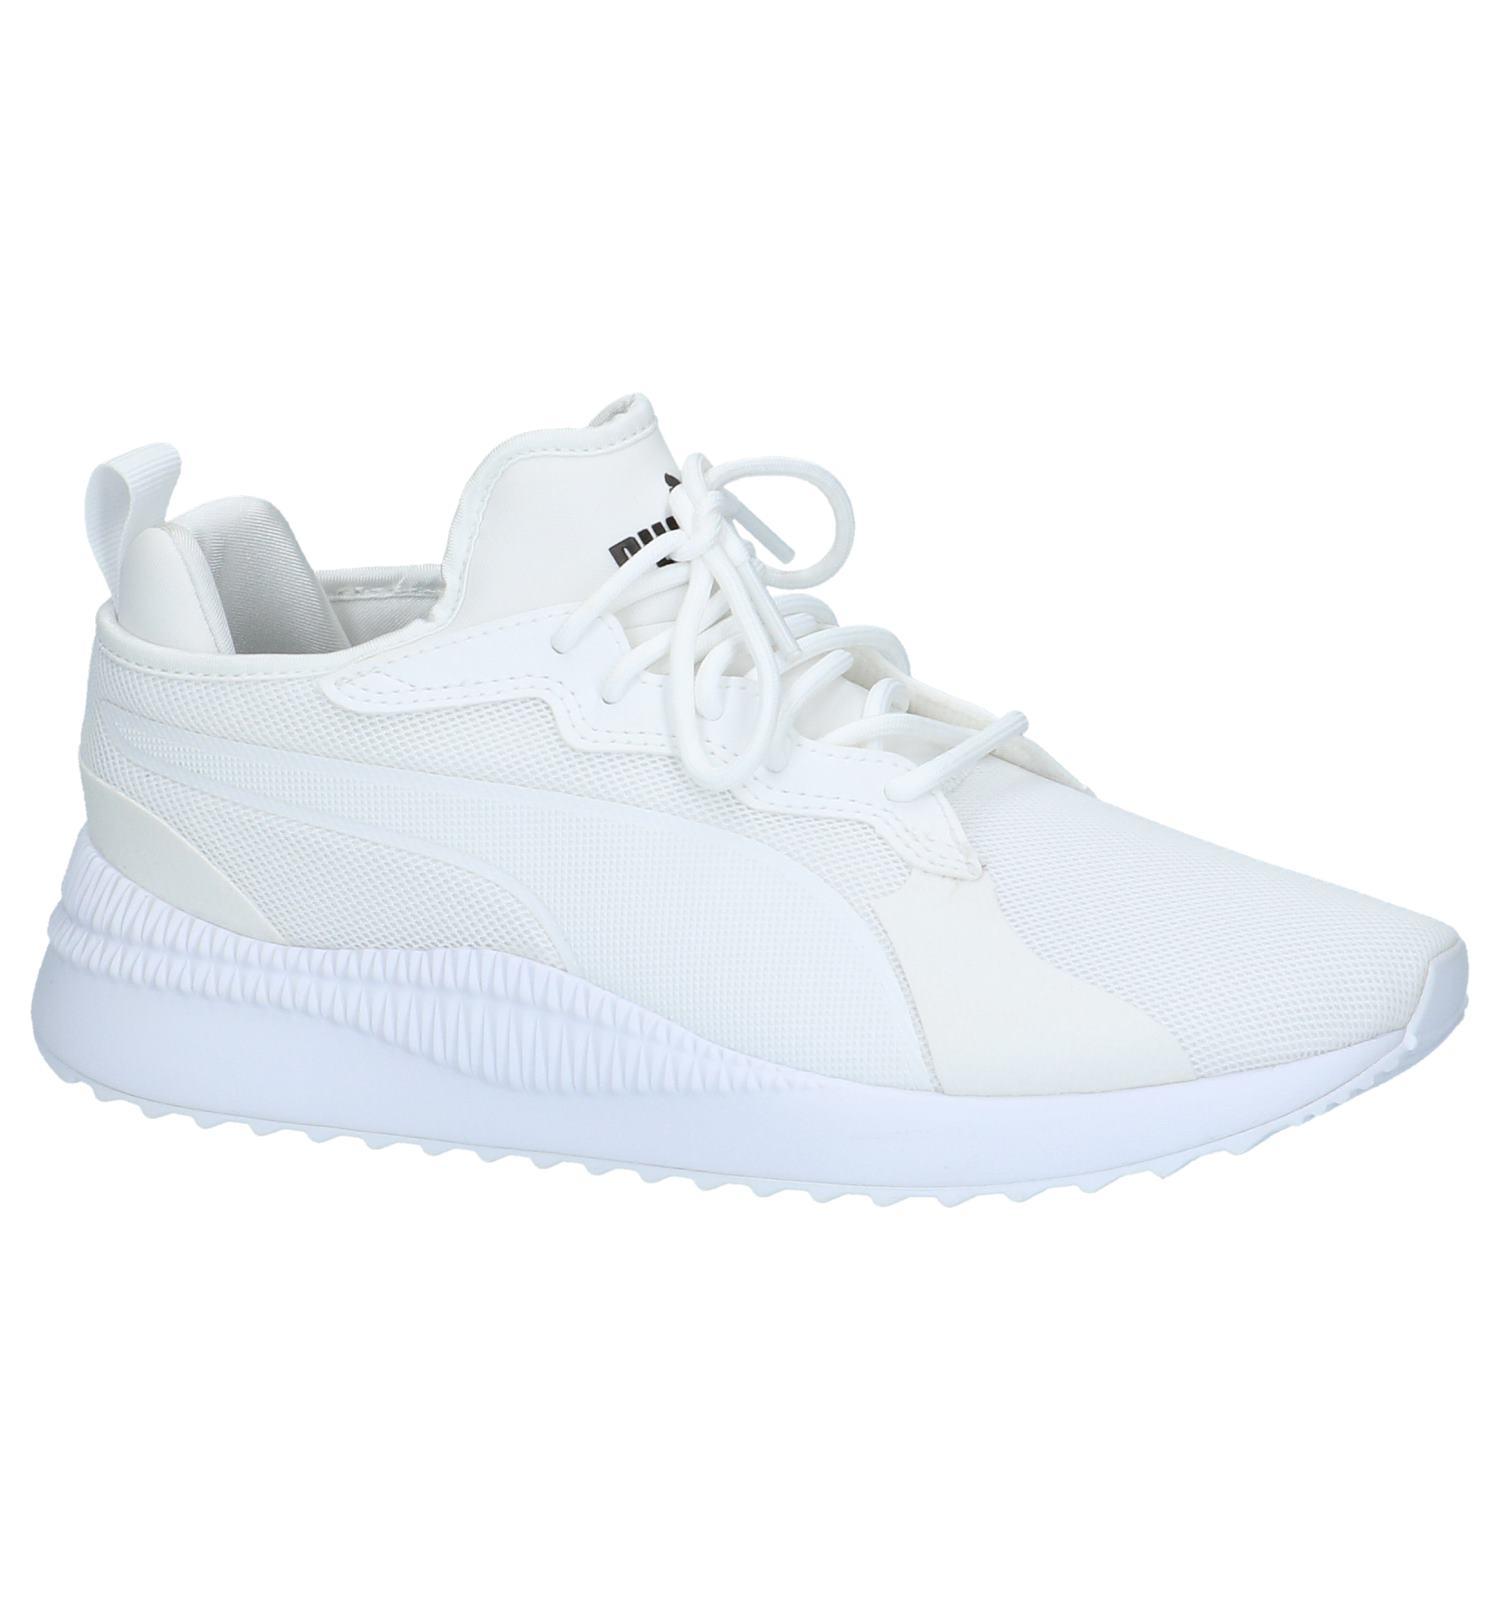 9be4794c7cb Witte Runner Sneakers Puma Pacer Next | TORFS.BE | Gratis verzend en retour